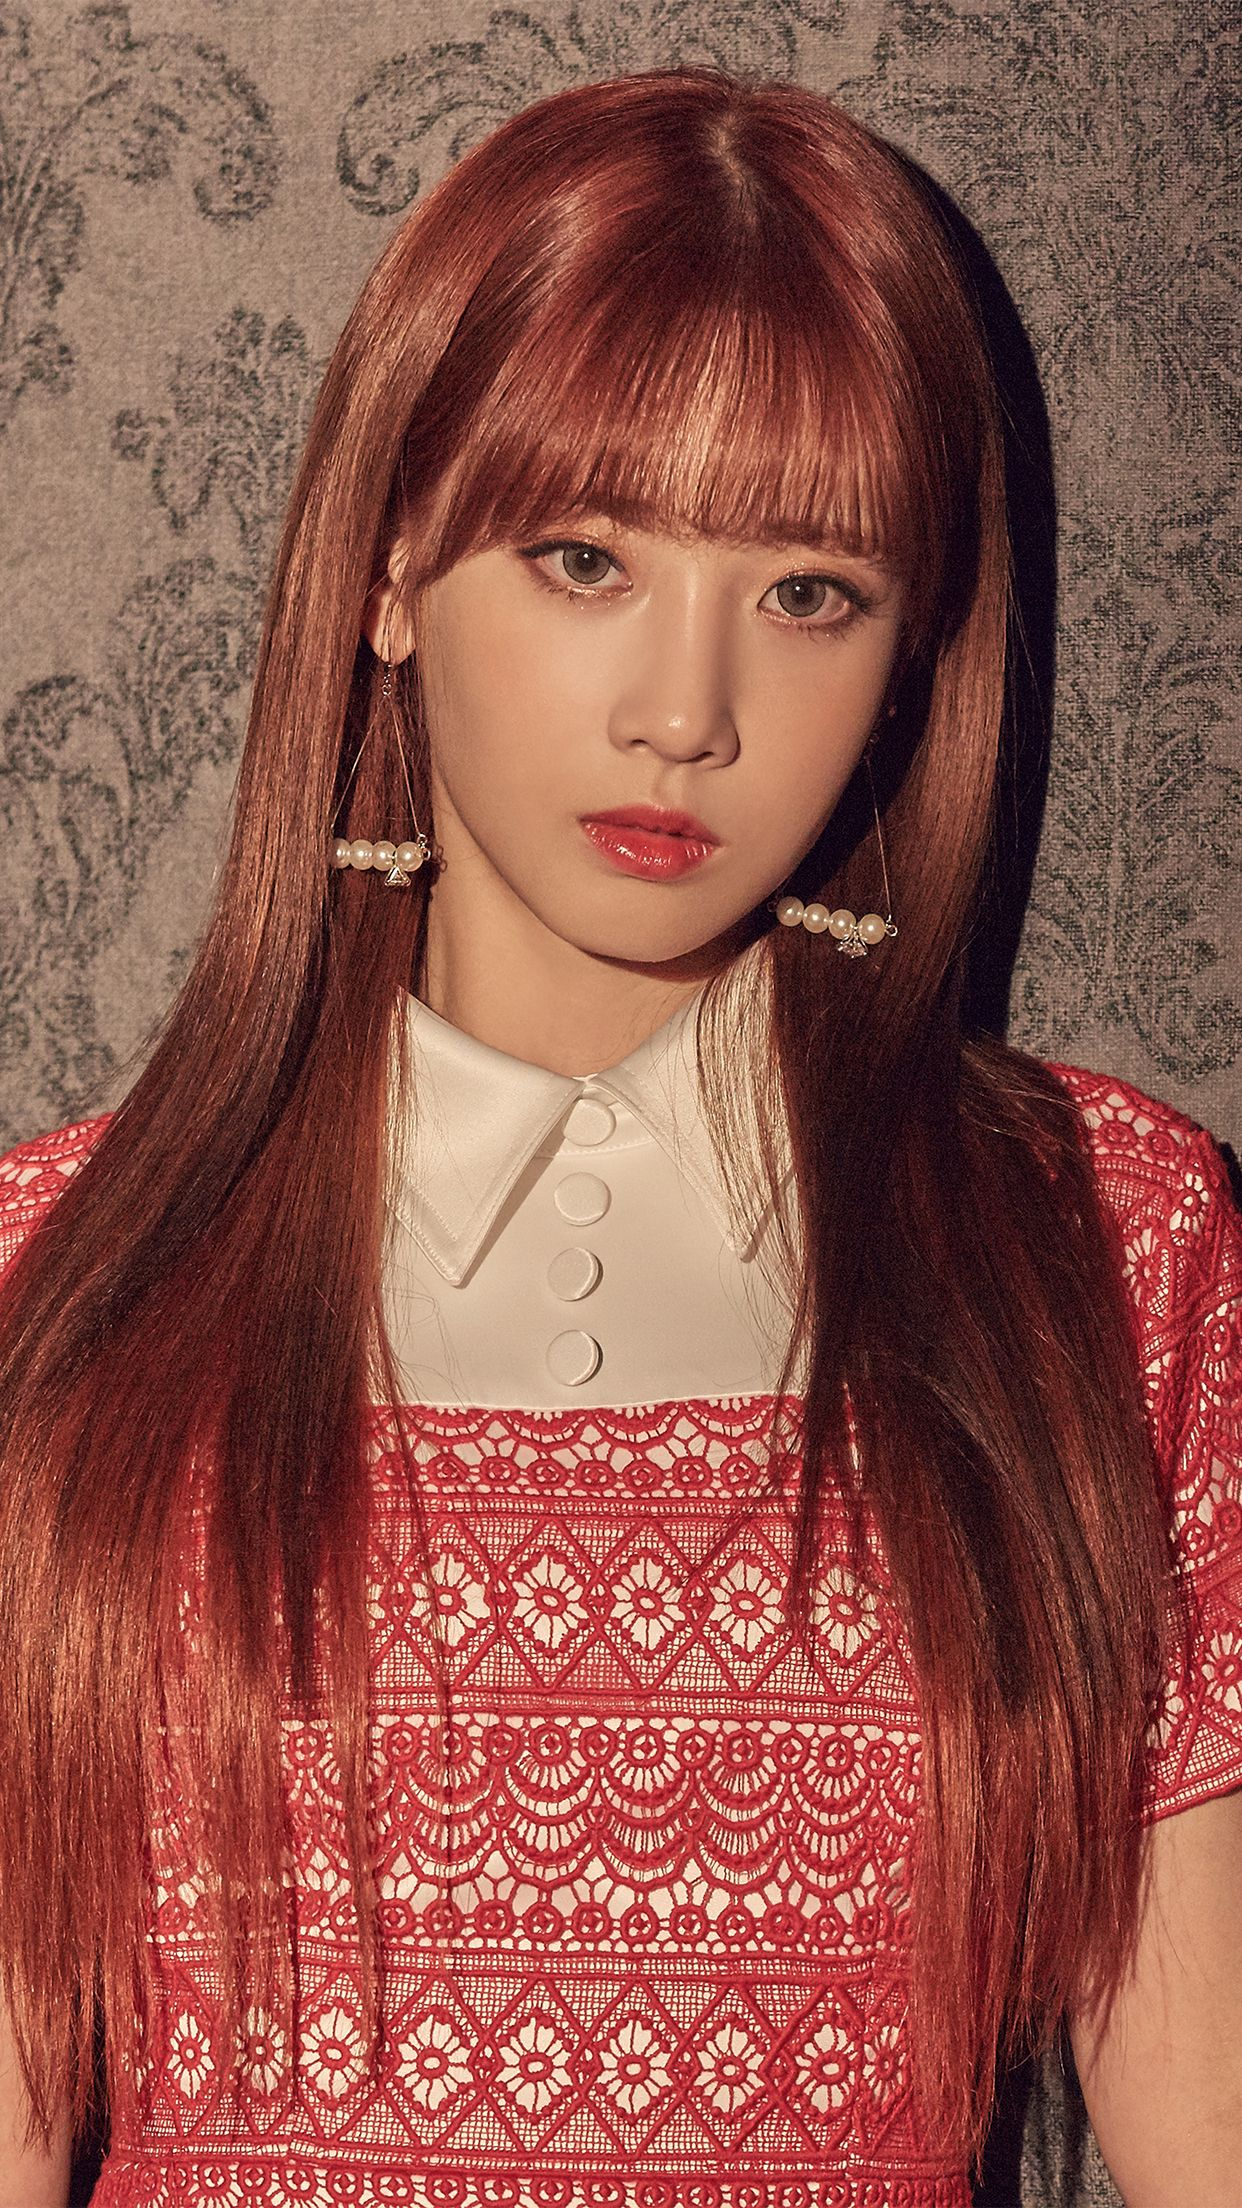 iPhone Wallpaper / Lovelyz 러블리즈 YooJiae 유지애 Jiae 지애